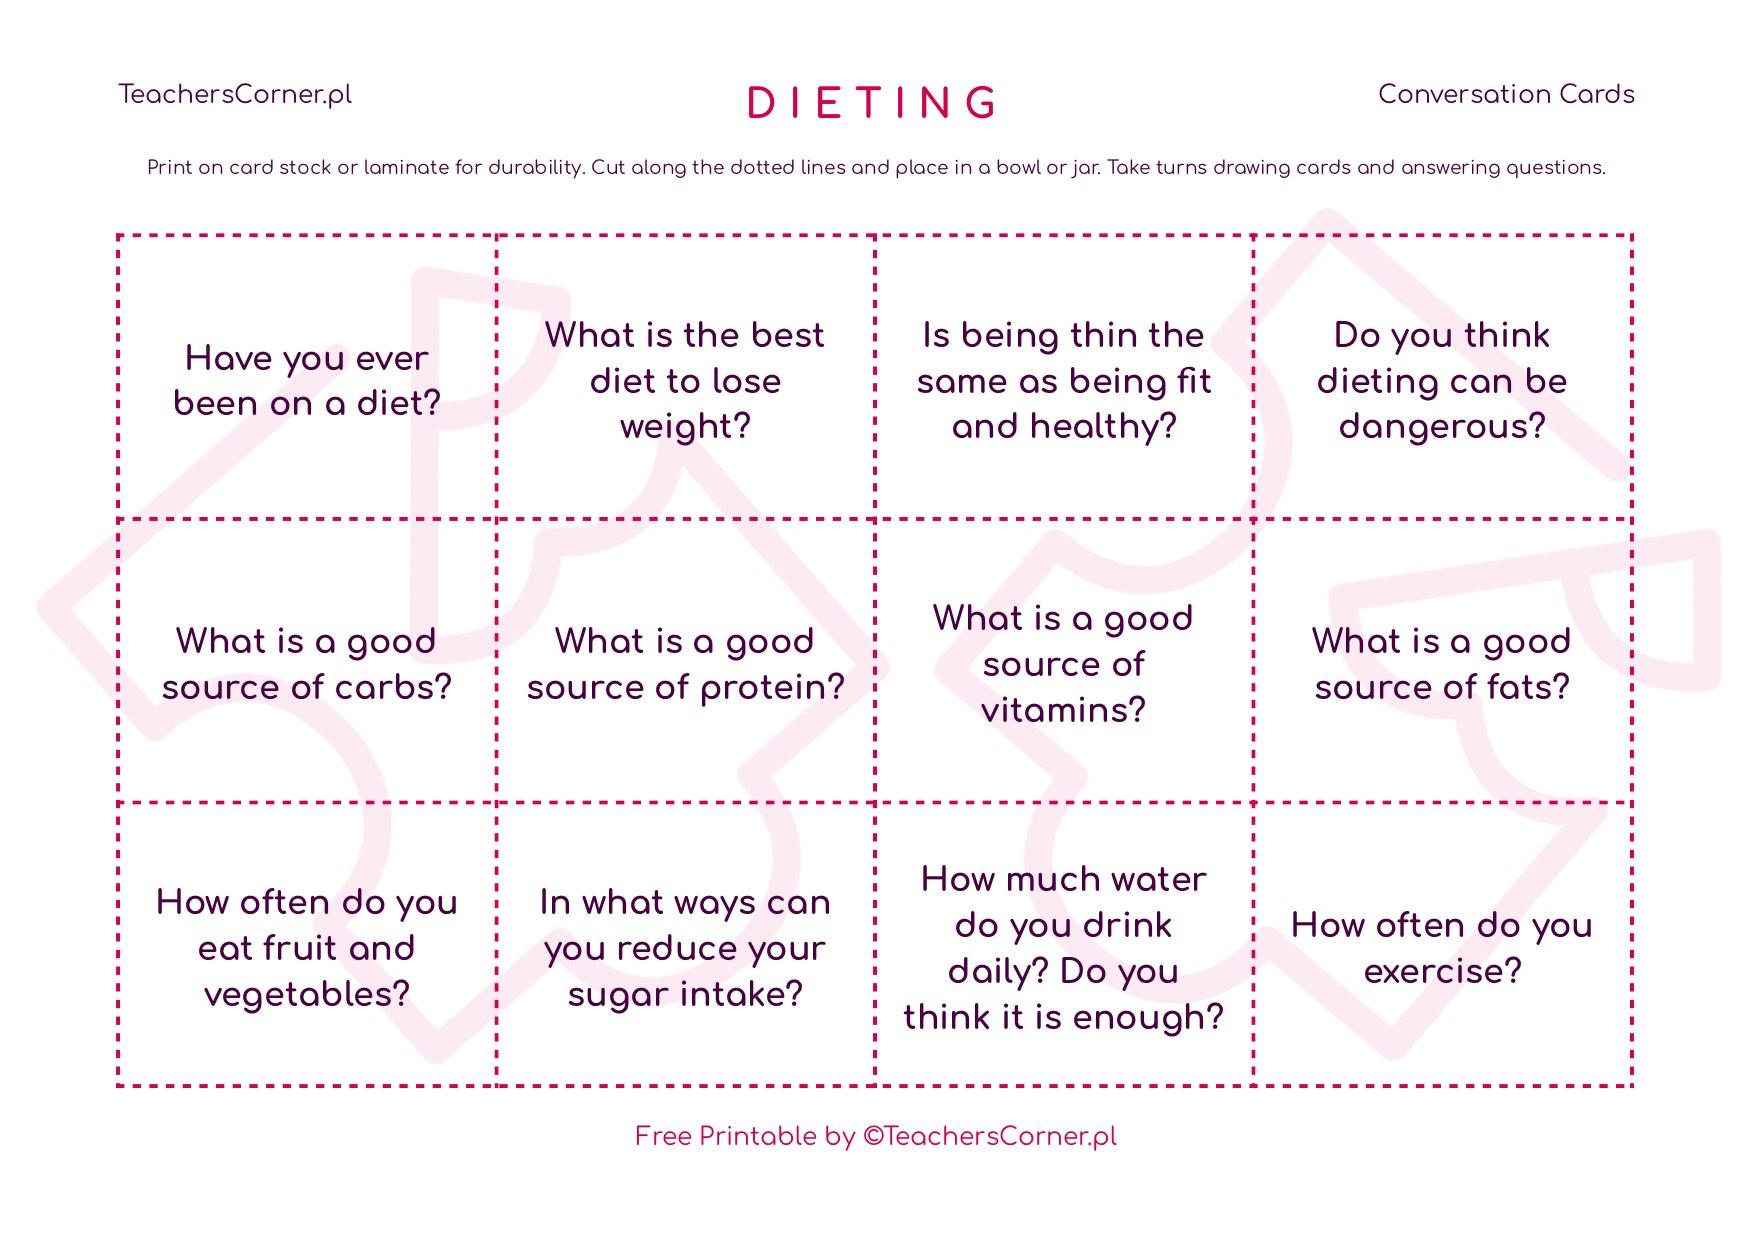 Karty konwersacyjne - Dieting